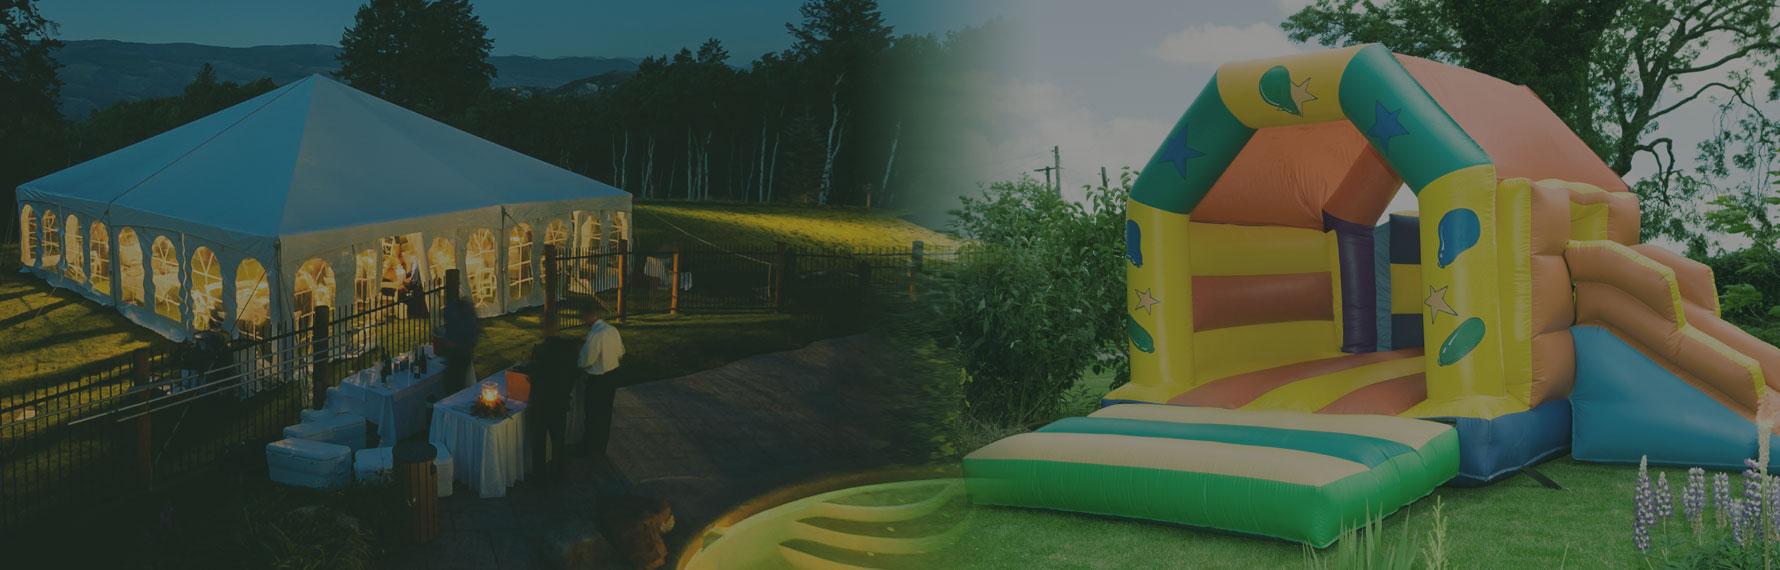 tents-bounce-houses-lighting-bg